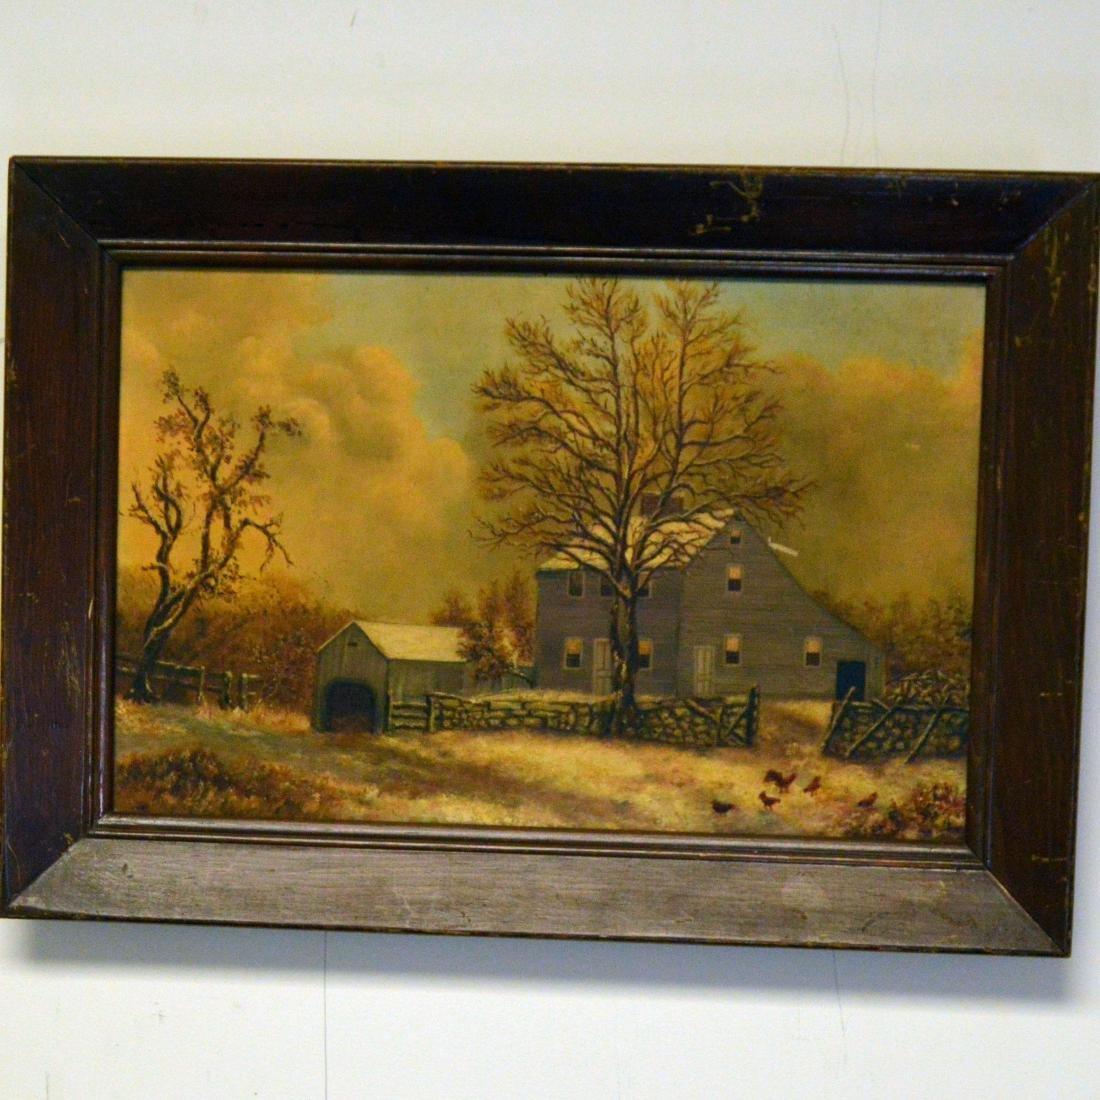 Old Framed Oil Painting